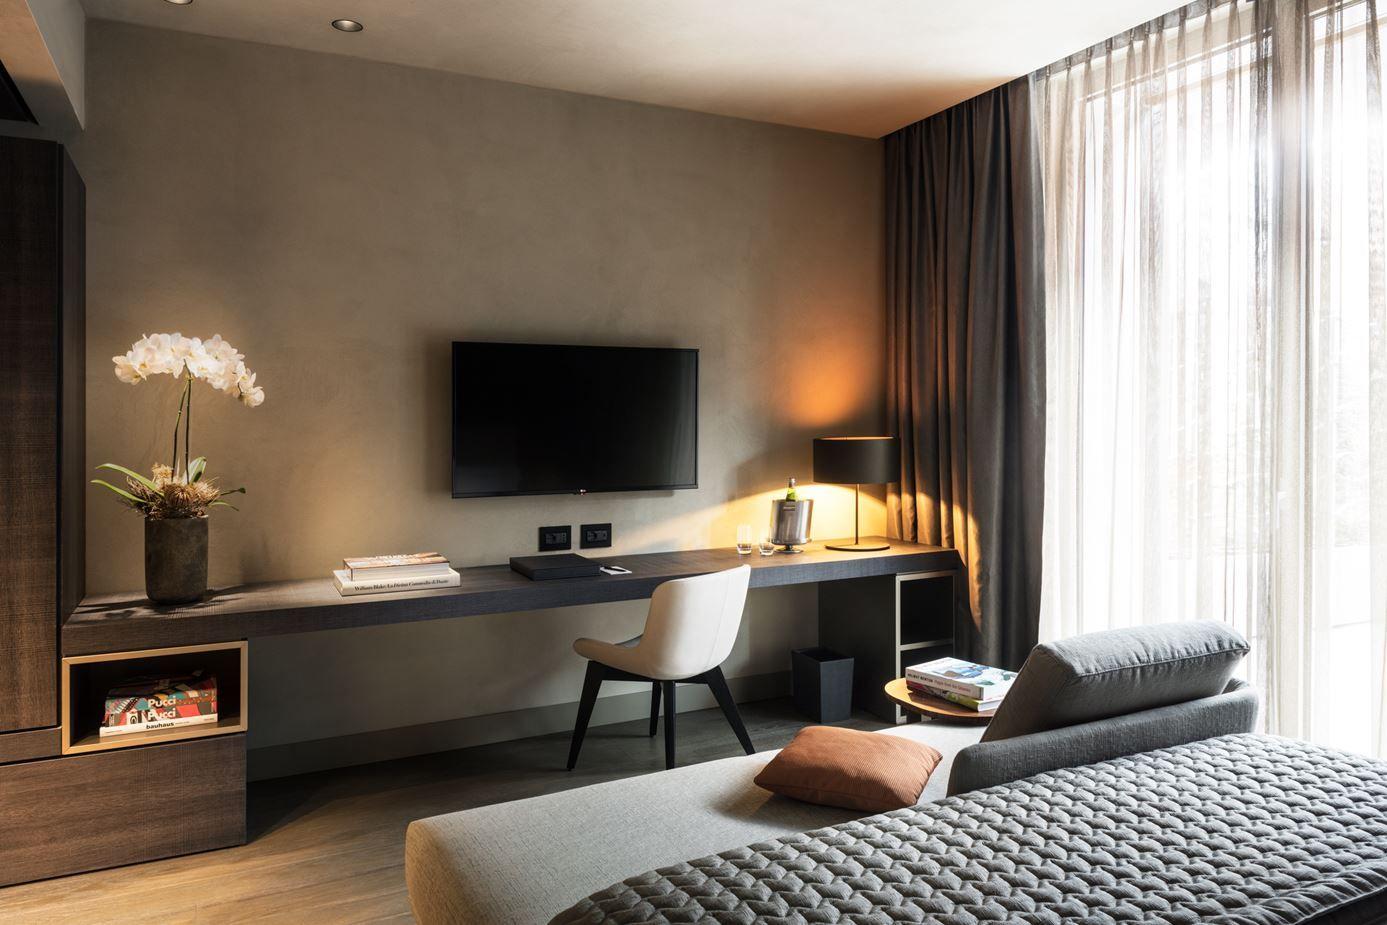 Hotel Viu Milan Picture Gallery Hotel Room Interior Modern